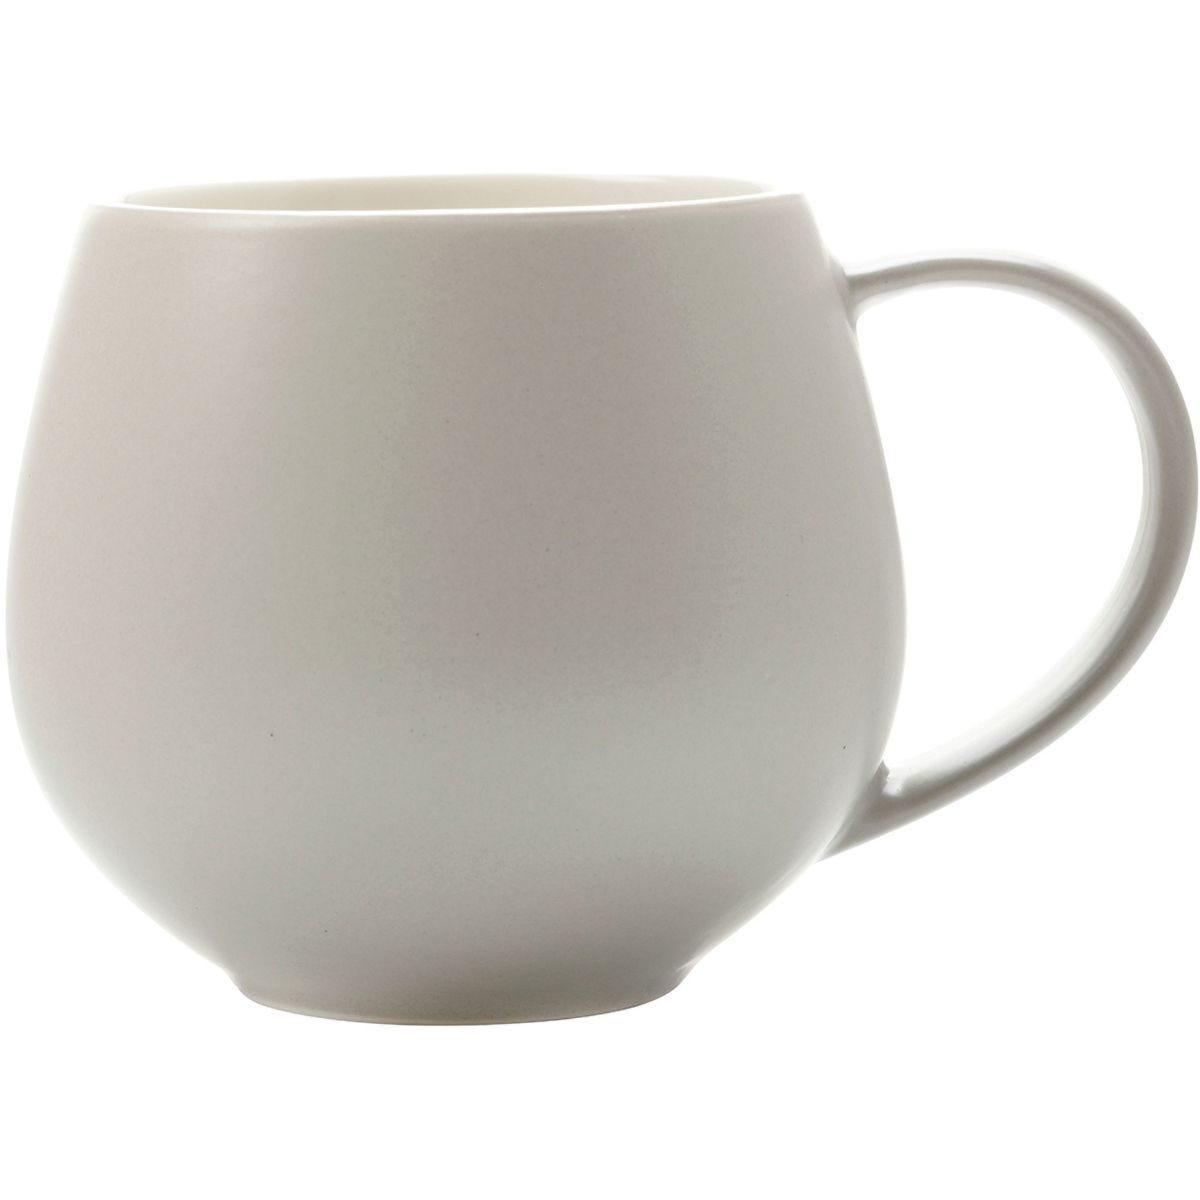 Maxwell & Williams Tint 450ml Snug Mug - Grey